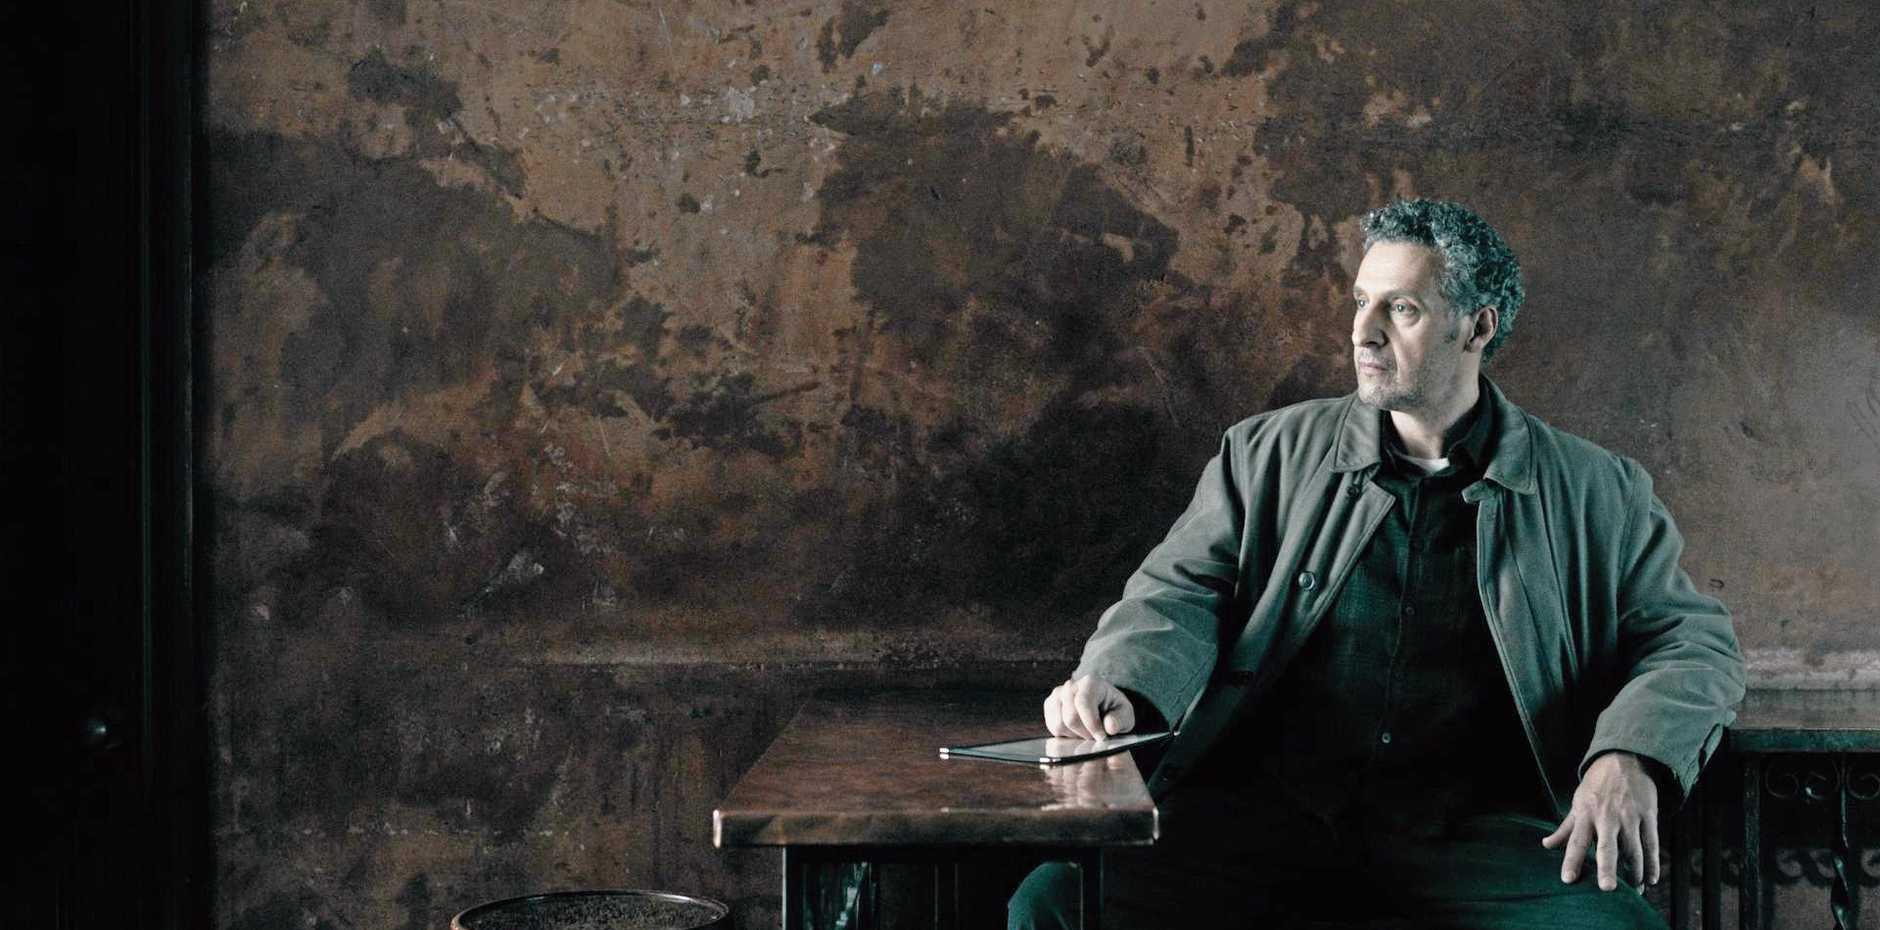 John Turturro in a scene from TV series The Night Of.